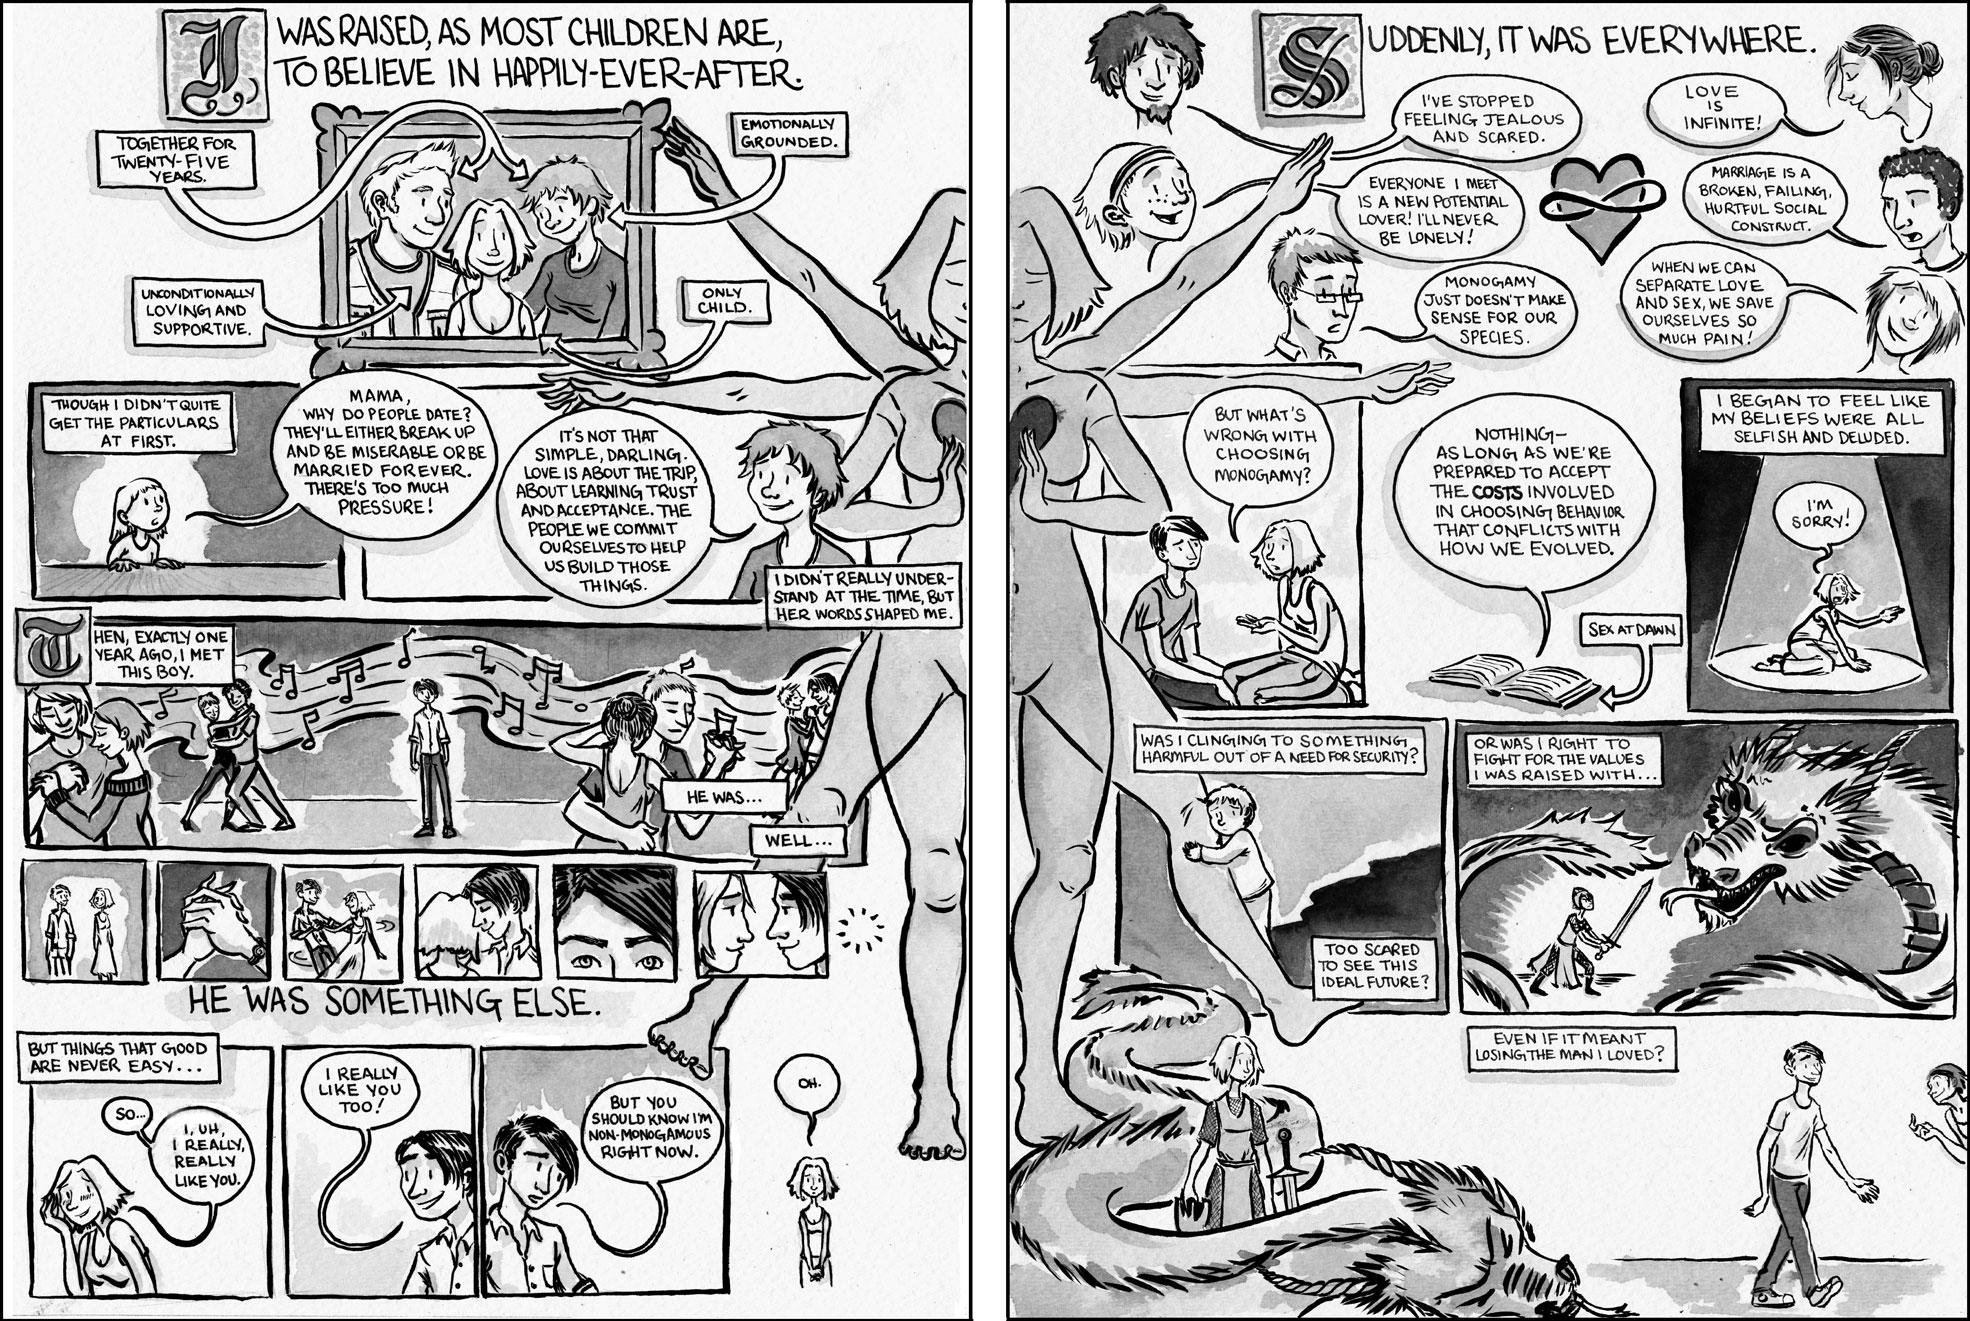 Lesbian nude cartoon comic strips